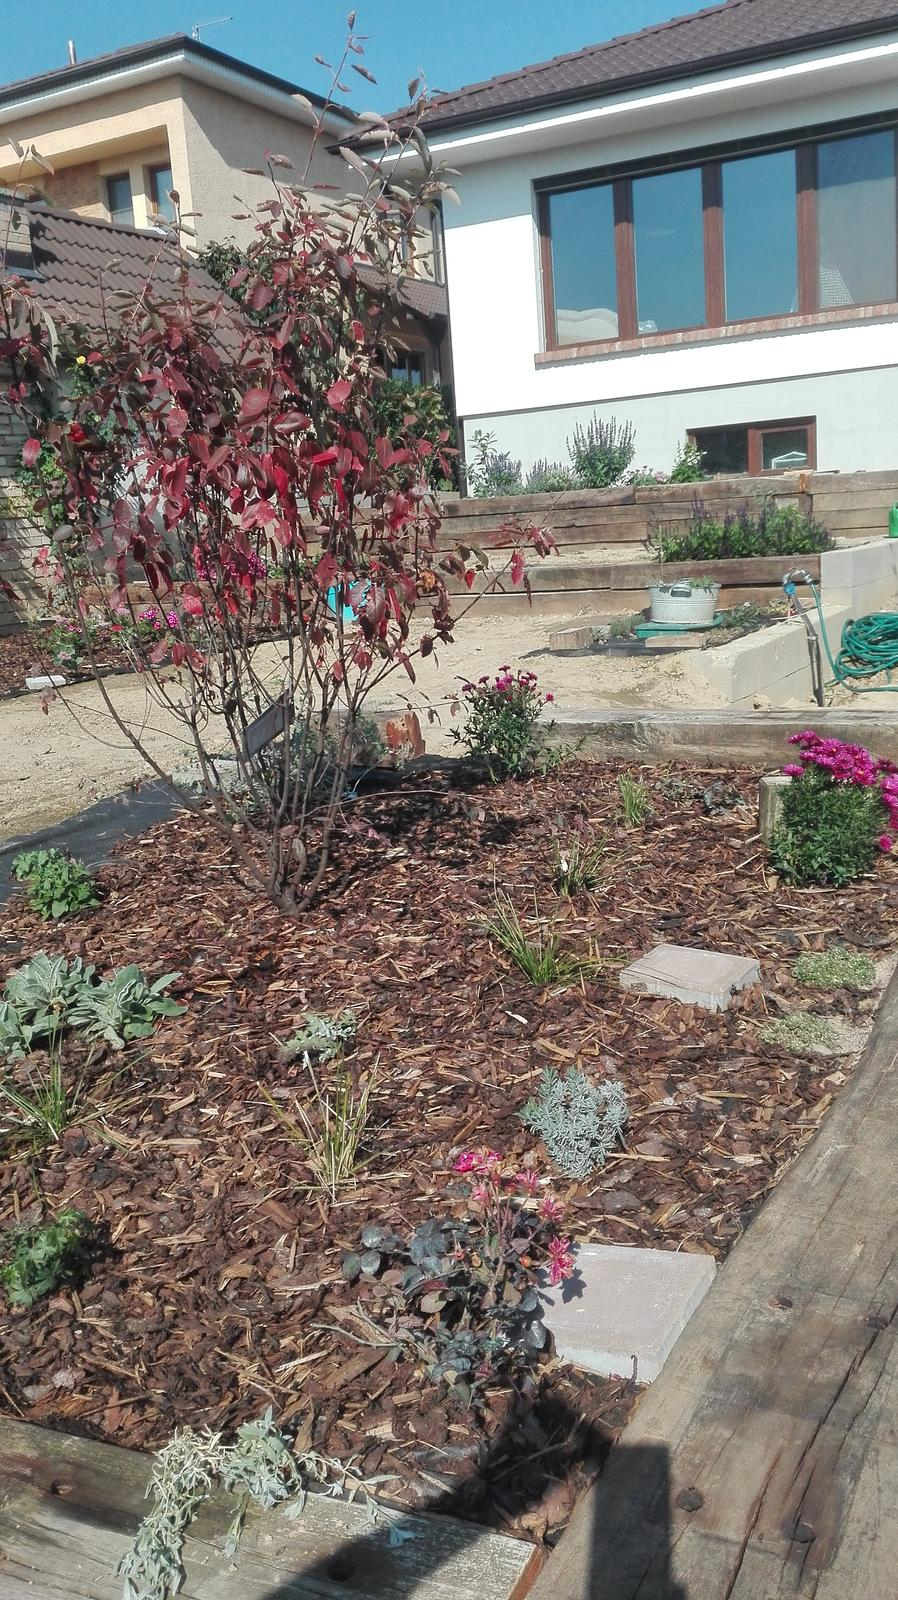 Názov stavby 3 - in da garden - muchovník krásne očervenal